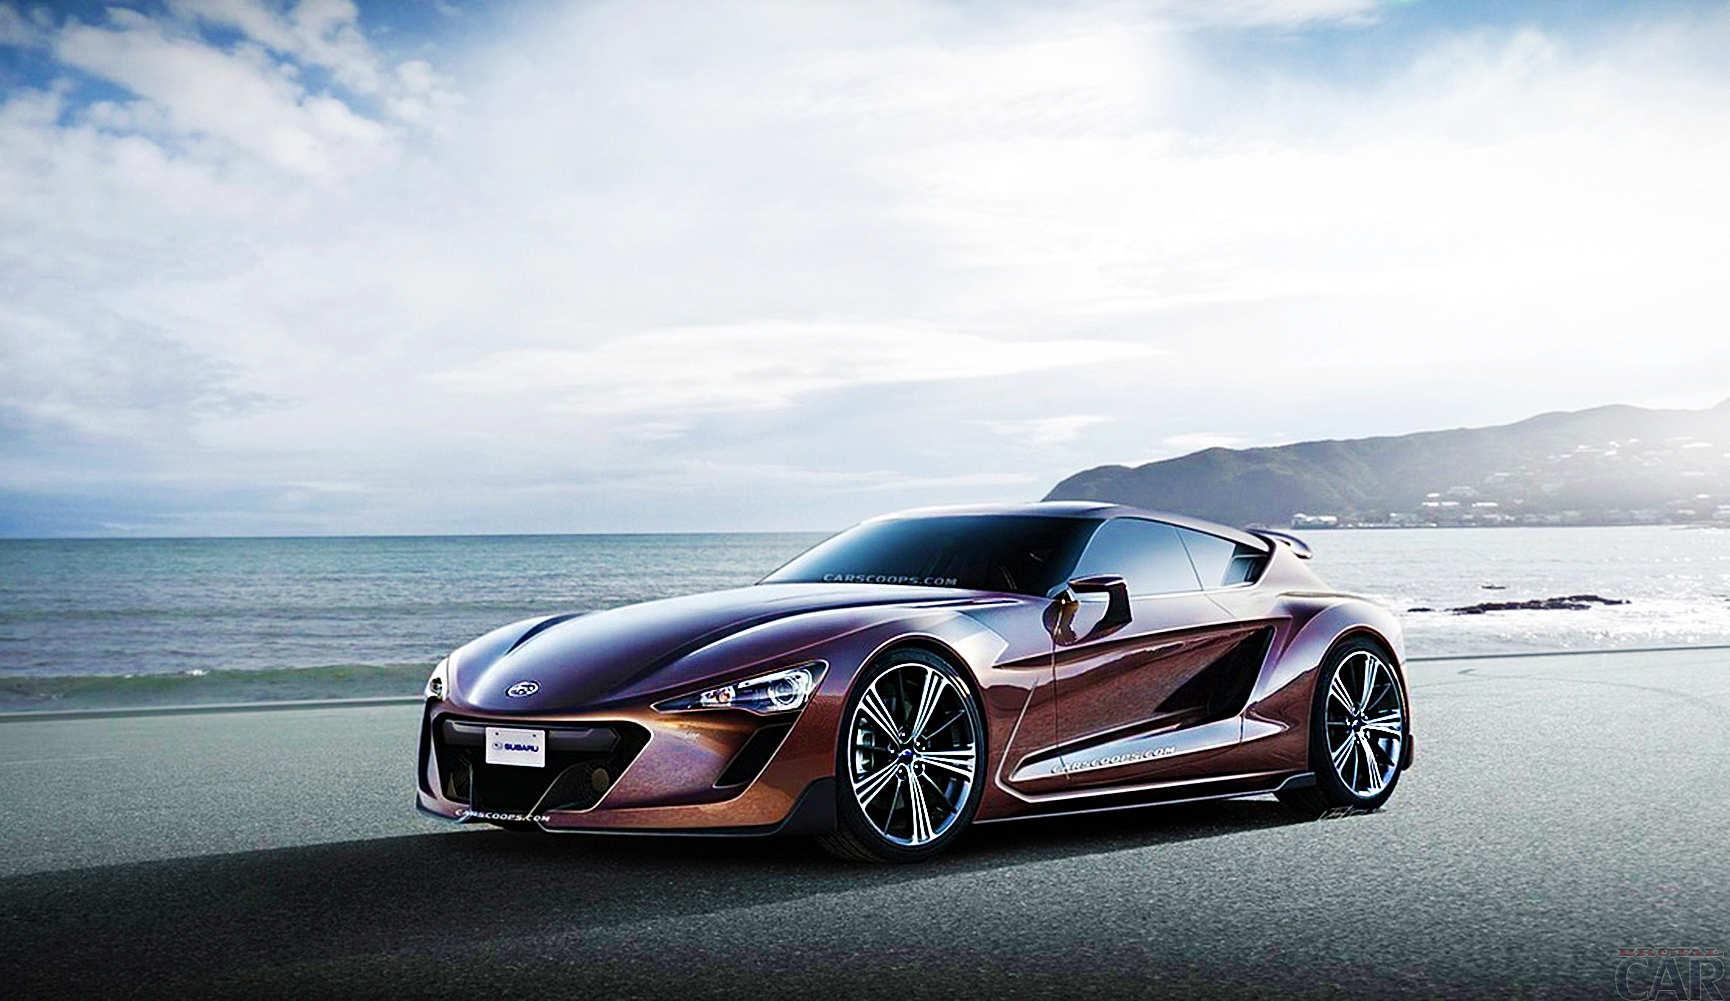 Fast And Furious 6 Cars Hd Wallpaper Tuned Cars Wallpapers Hd Baixe Fotos Bonitas E Bonitas